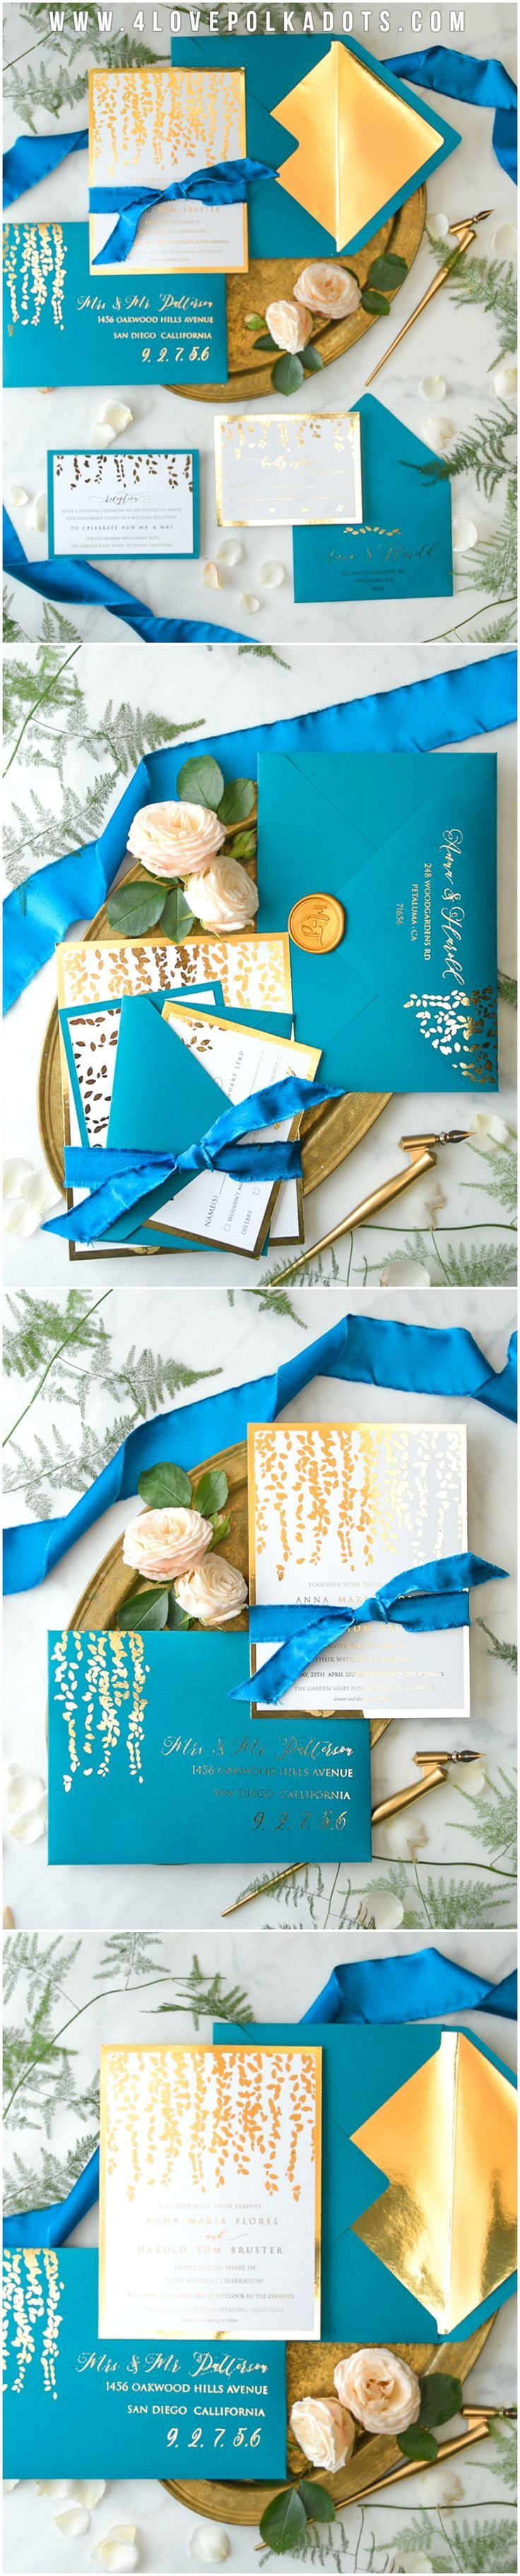 Cyan & Gold Wedding Invitations - shades of blue #weddingideas #cyan #teal #turquoise #elegant #unique #peacockblue #weddinginvitations